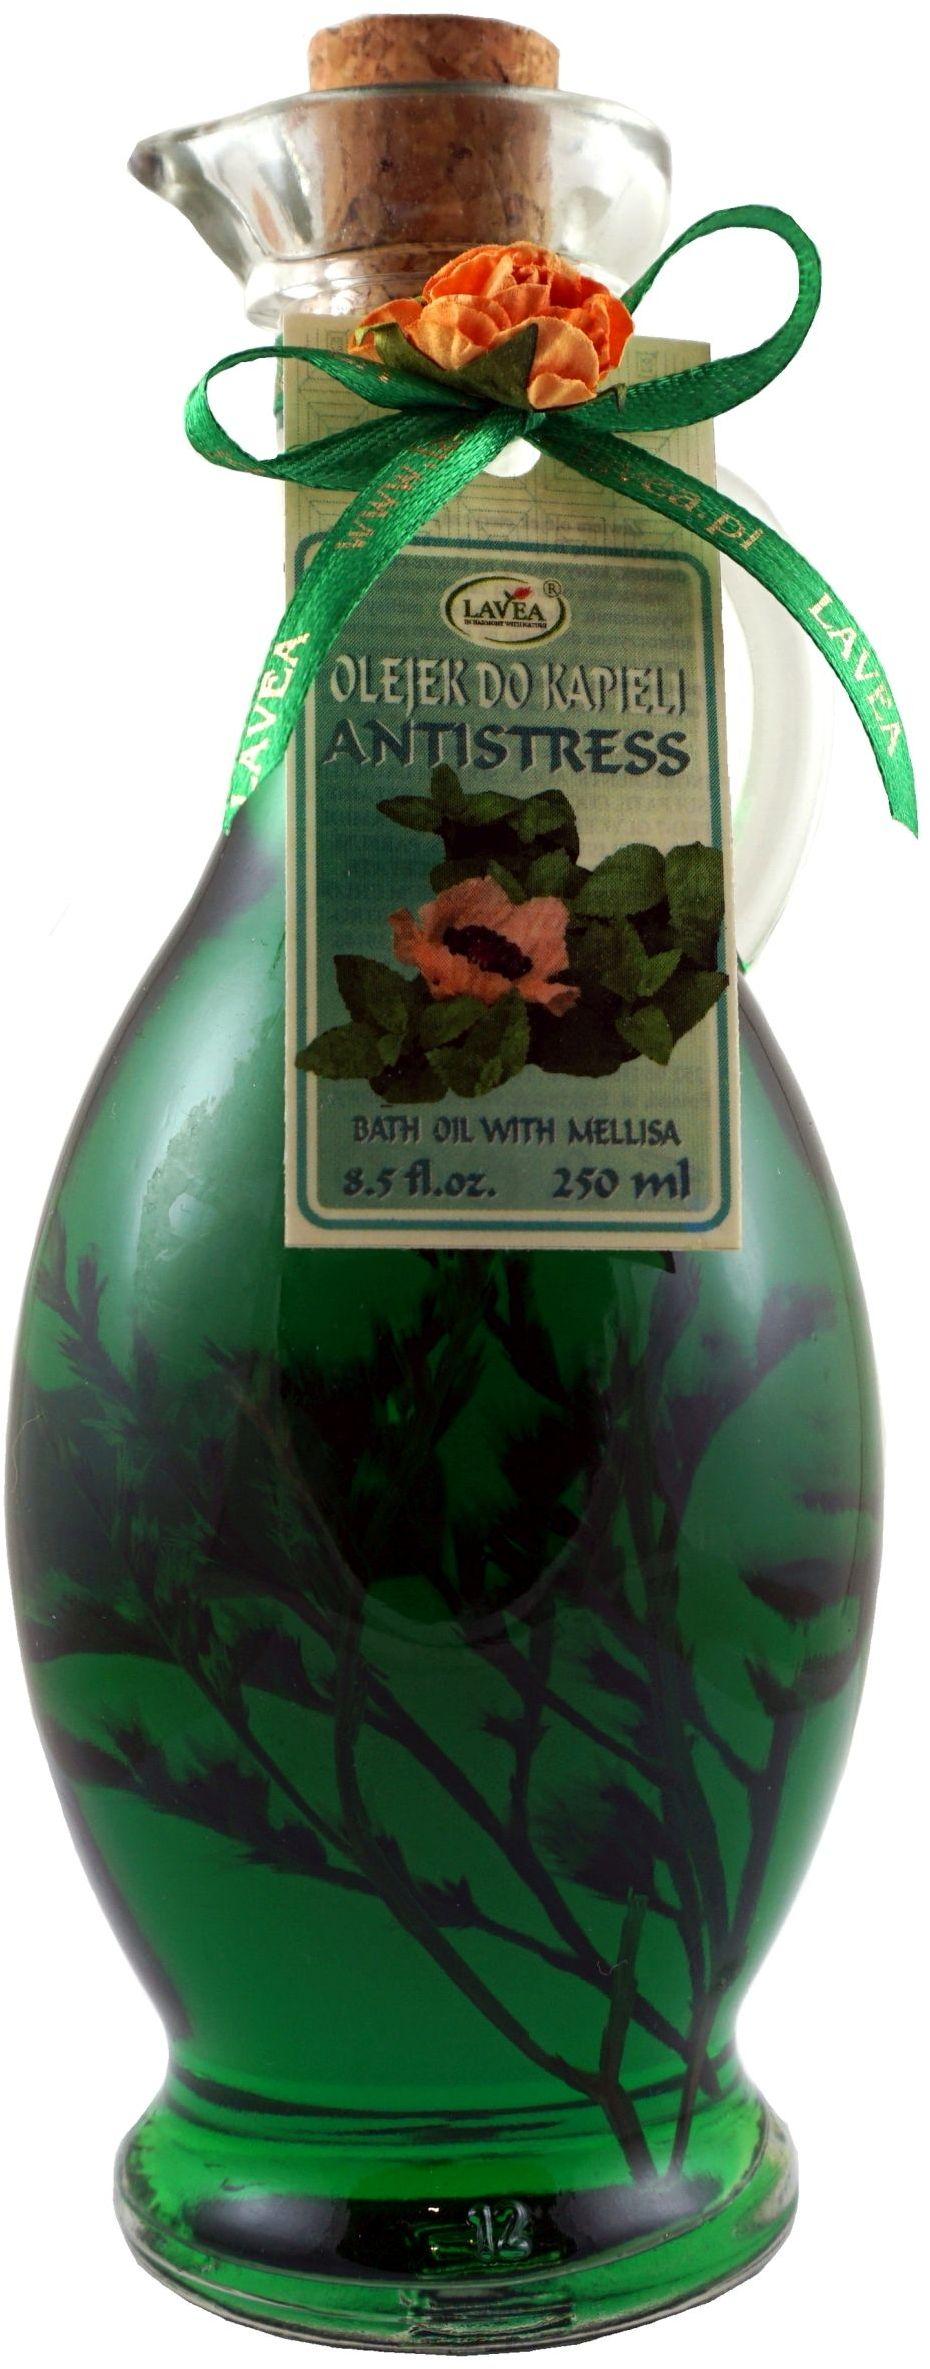 Olejek do kąpieli - Zielona Herbata - 250 ml - Lavea